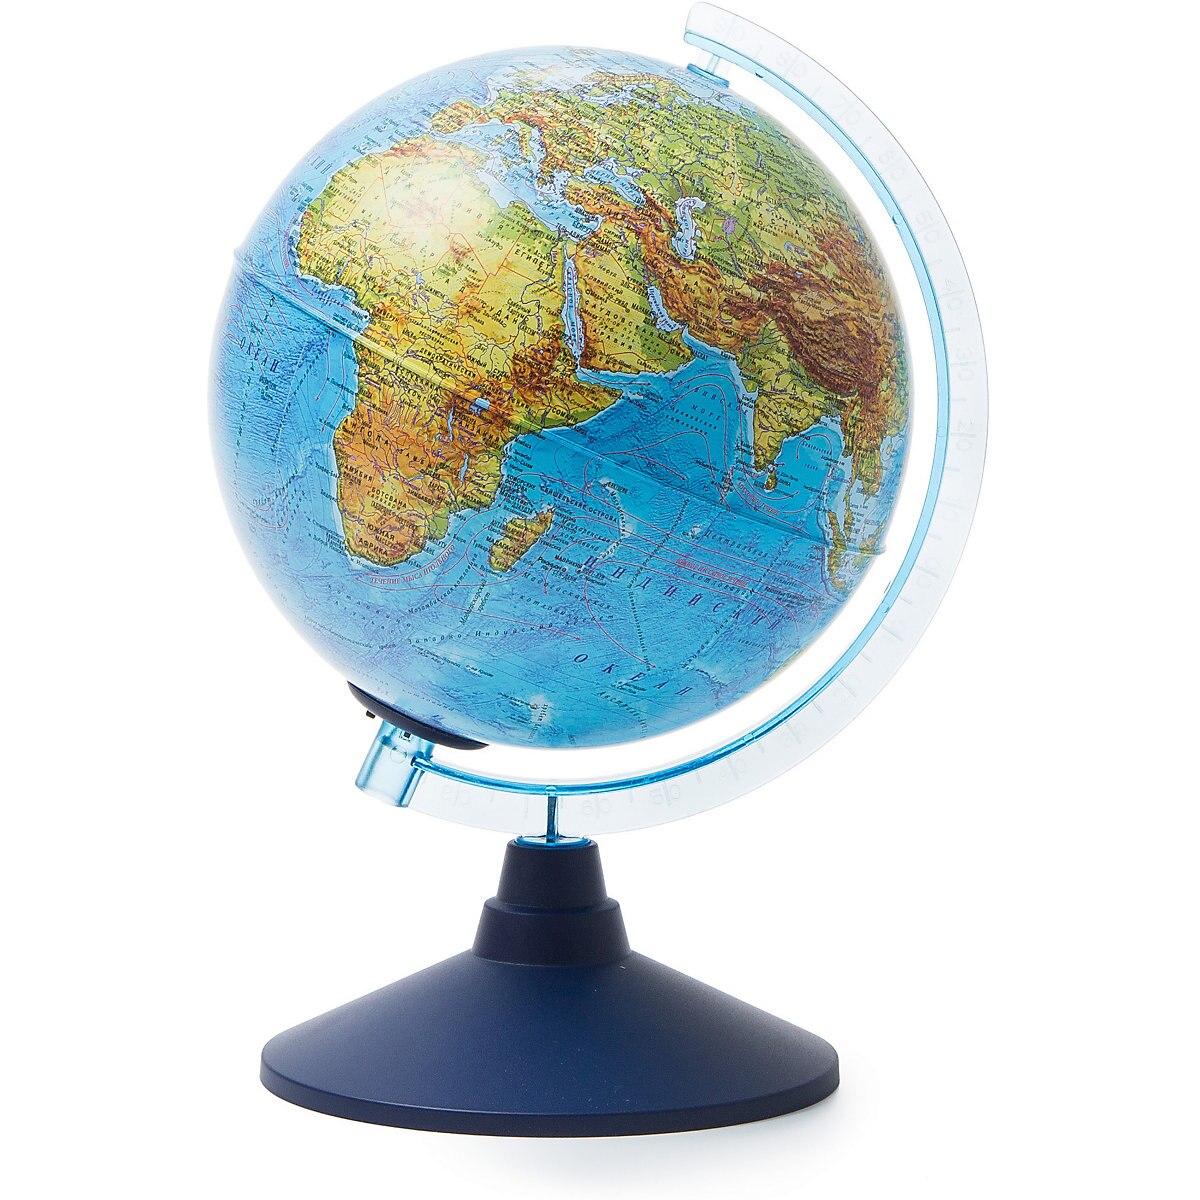 GLOBEN Desk Set 8075089 Globe Accessories Organizer For Office And School Schools Offices MTpromo